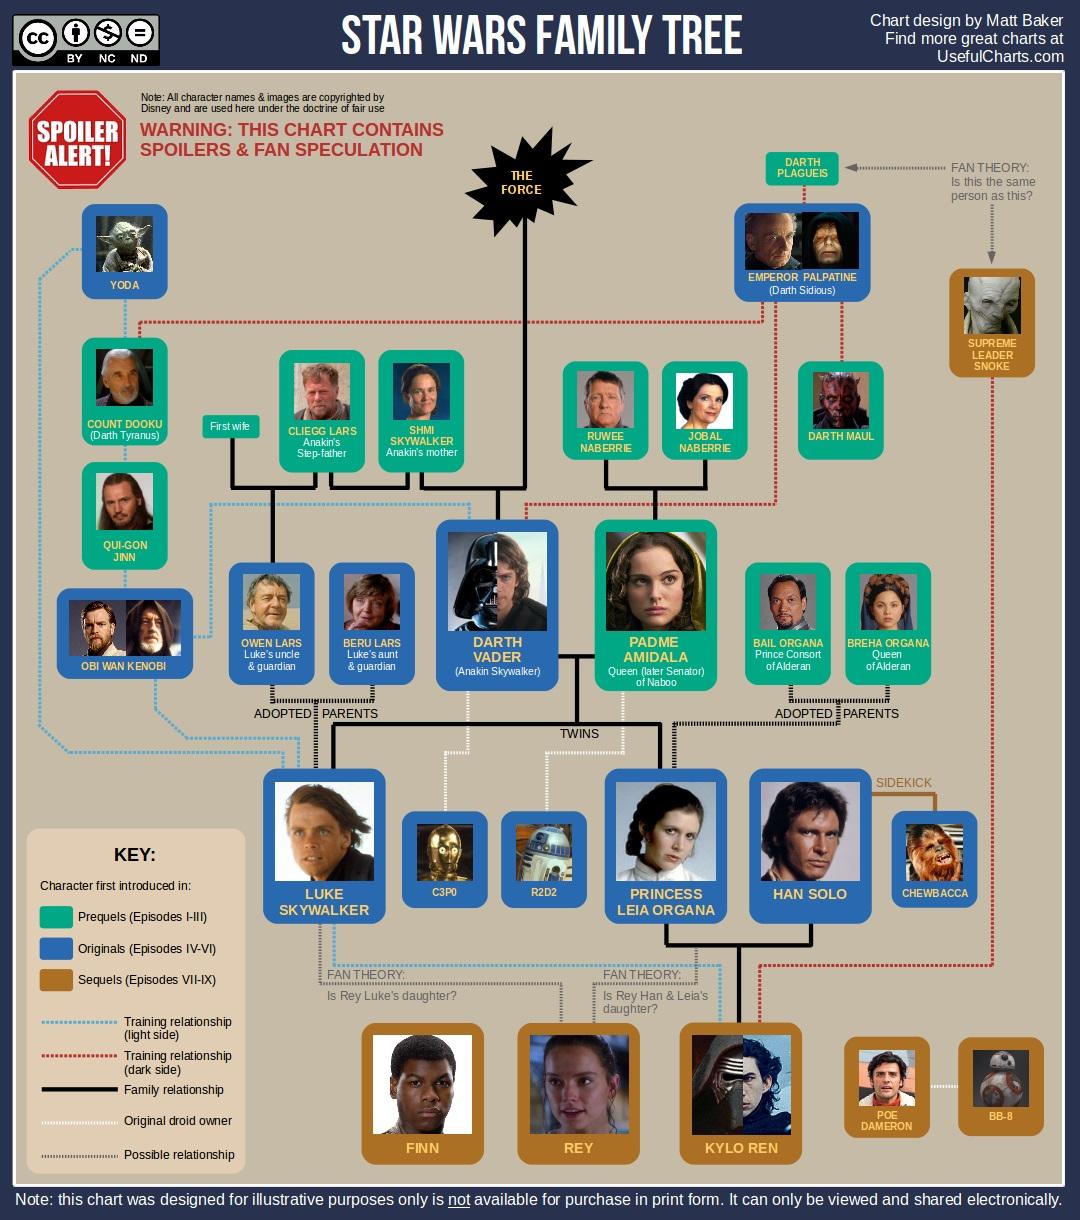 Star Wars Family Tree Chartgeek